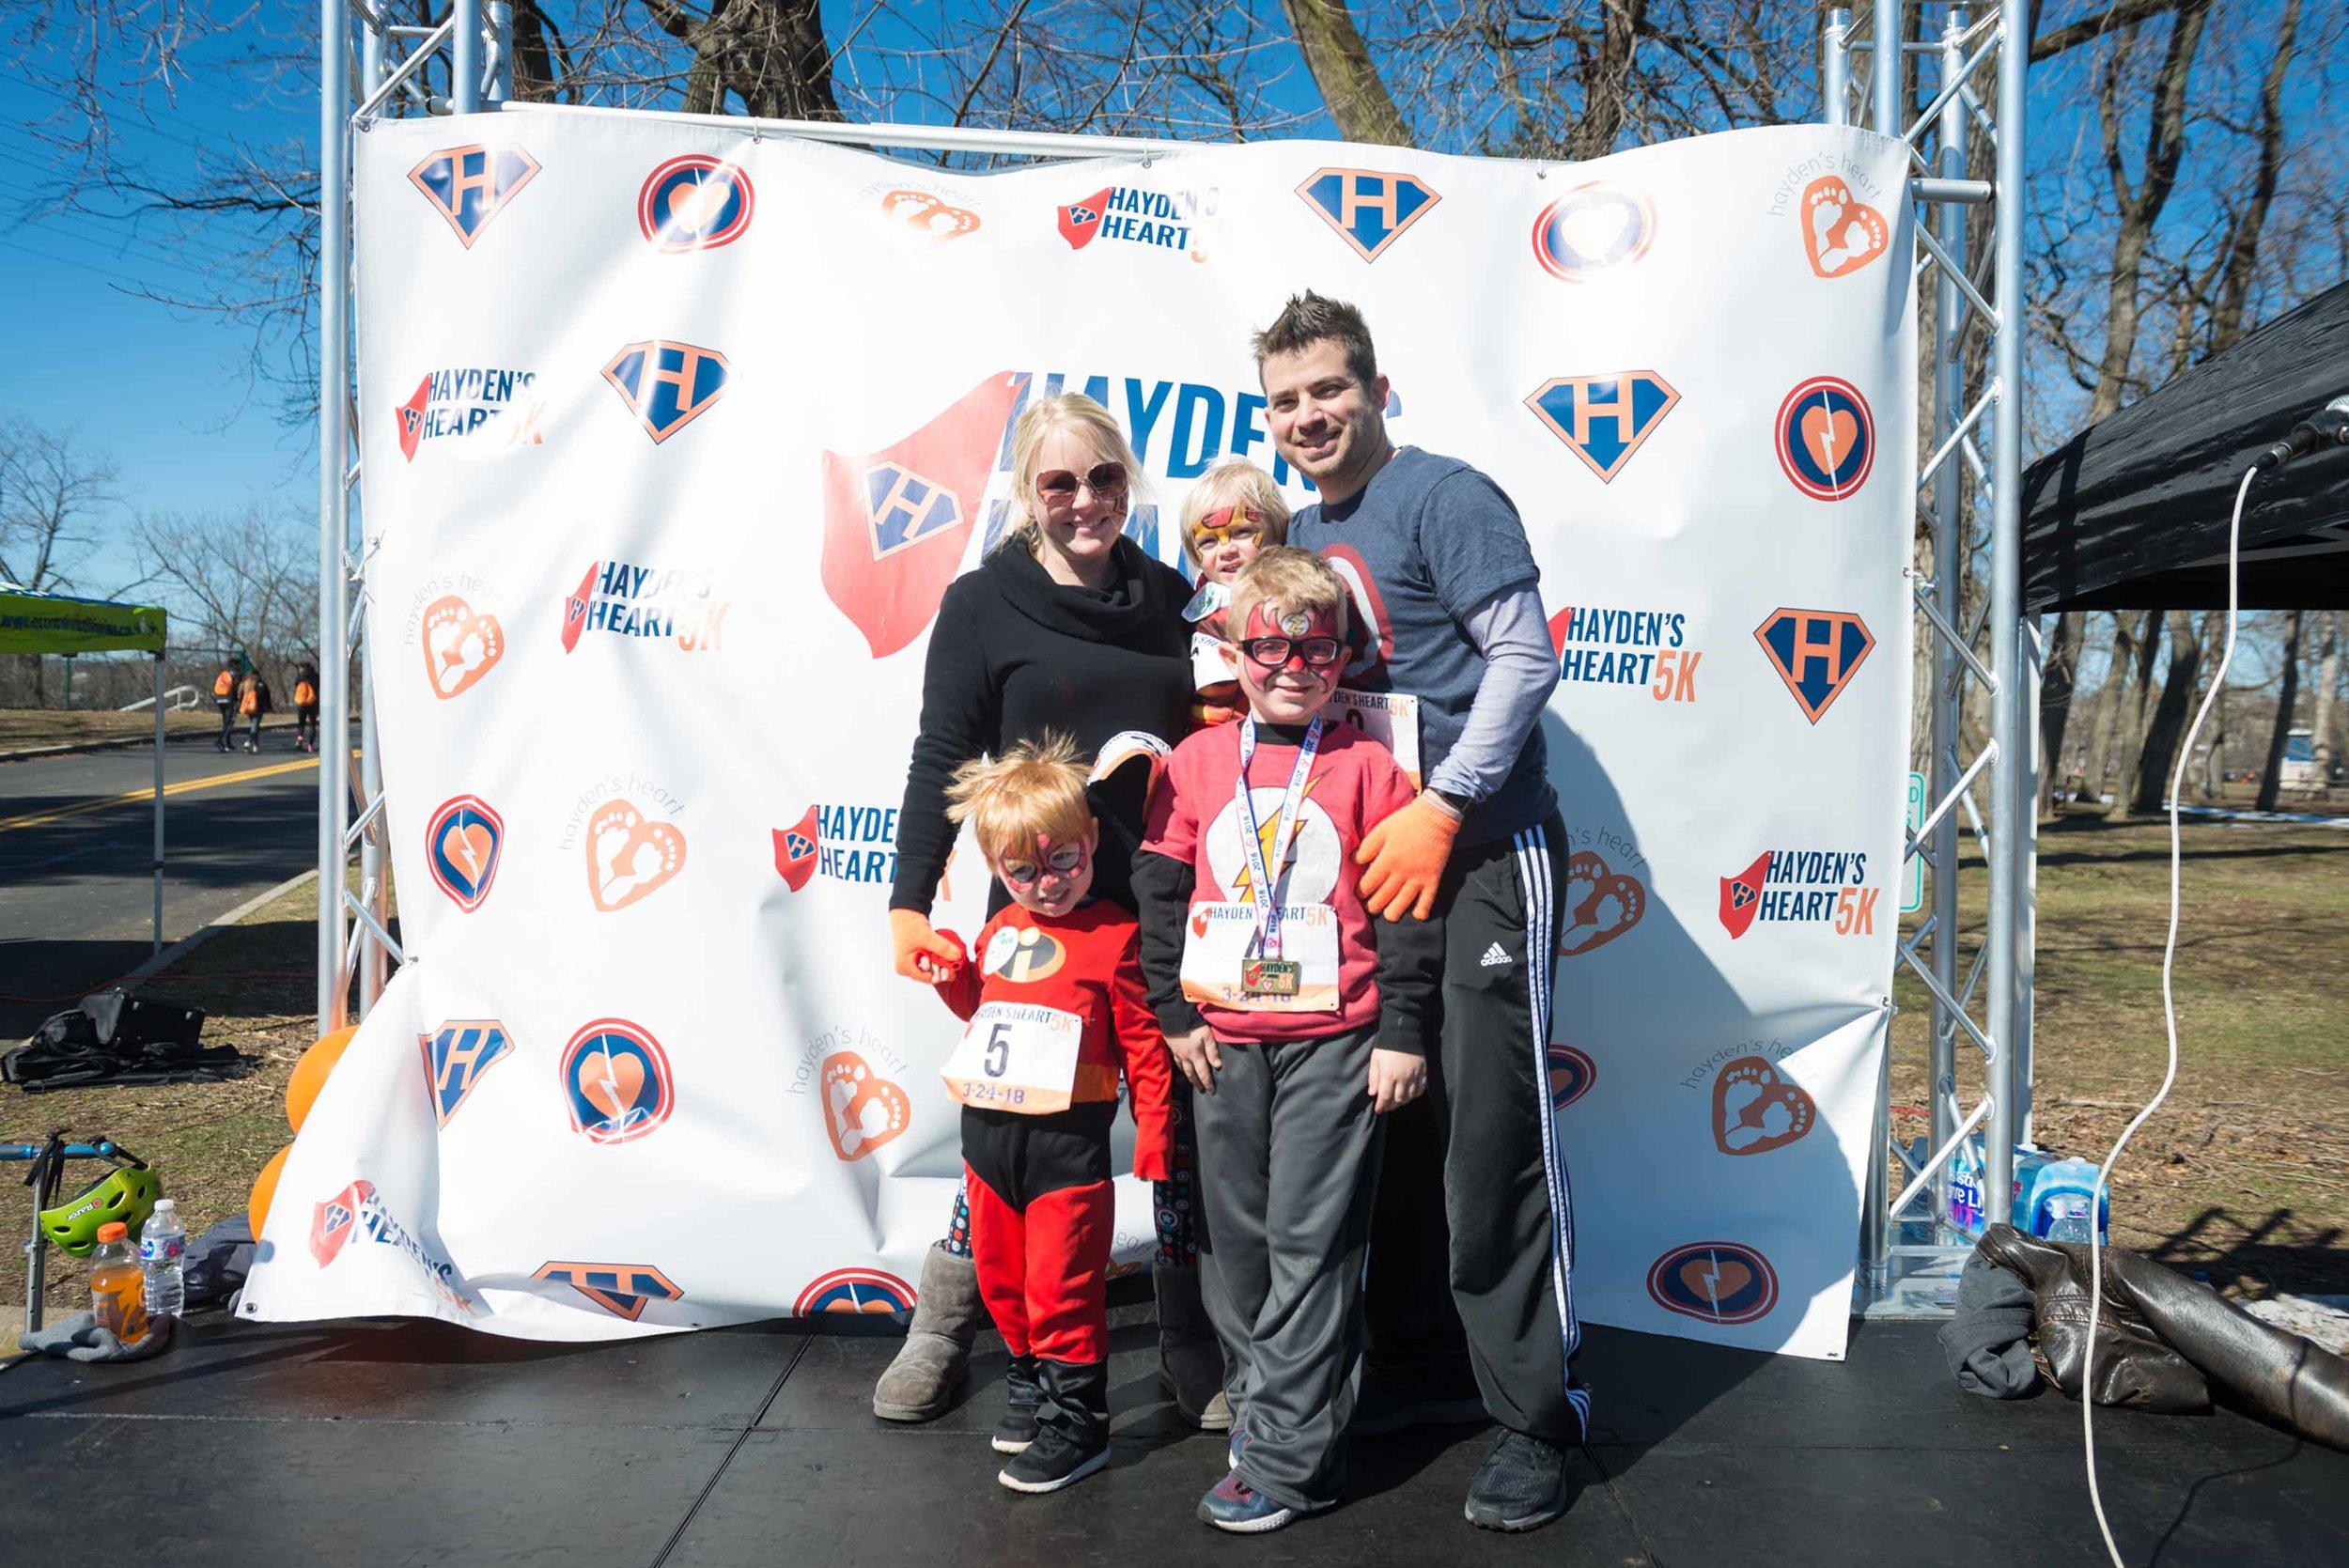 2018-03-24 Haydens Heart 5k - Riverside County Park - Lyndhurst NJ-168.jpg